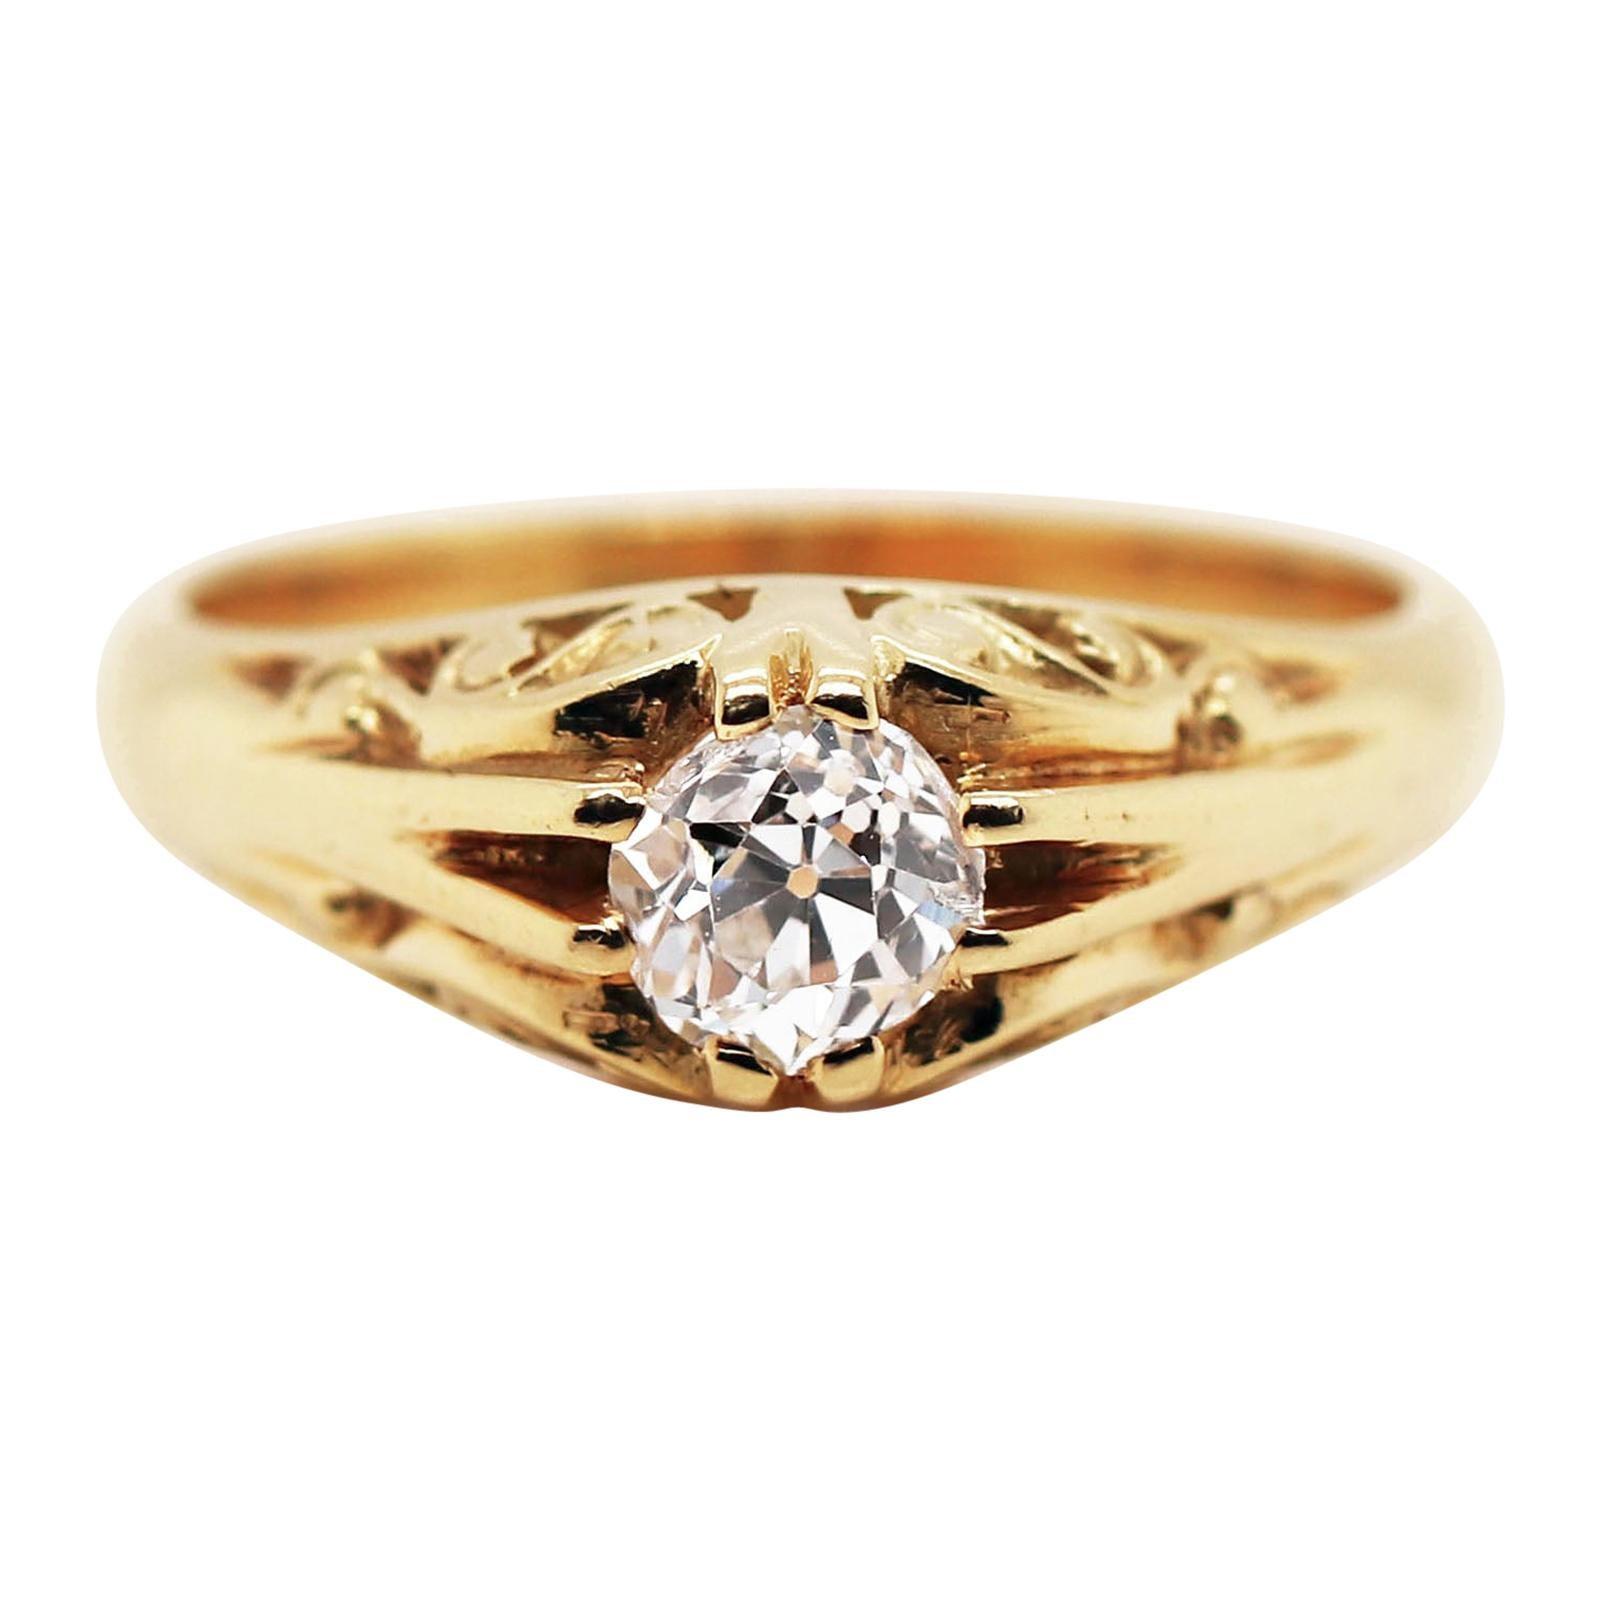 Old Cut Diamond 18 Carat Yellow Gold Gypsy Ring